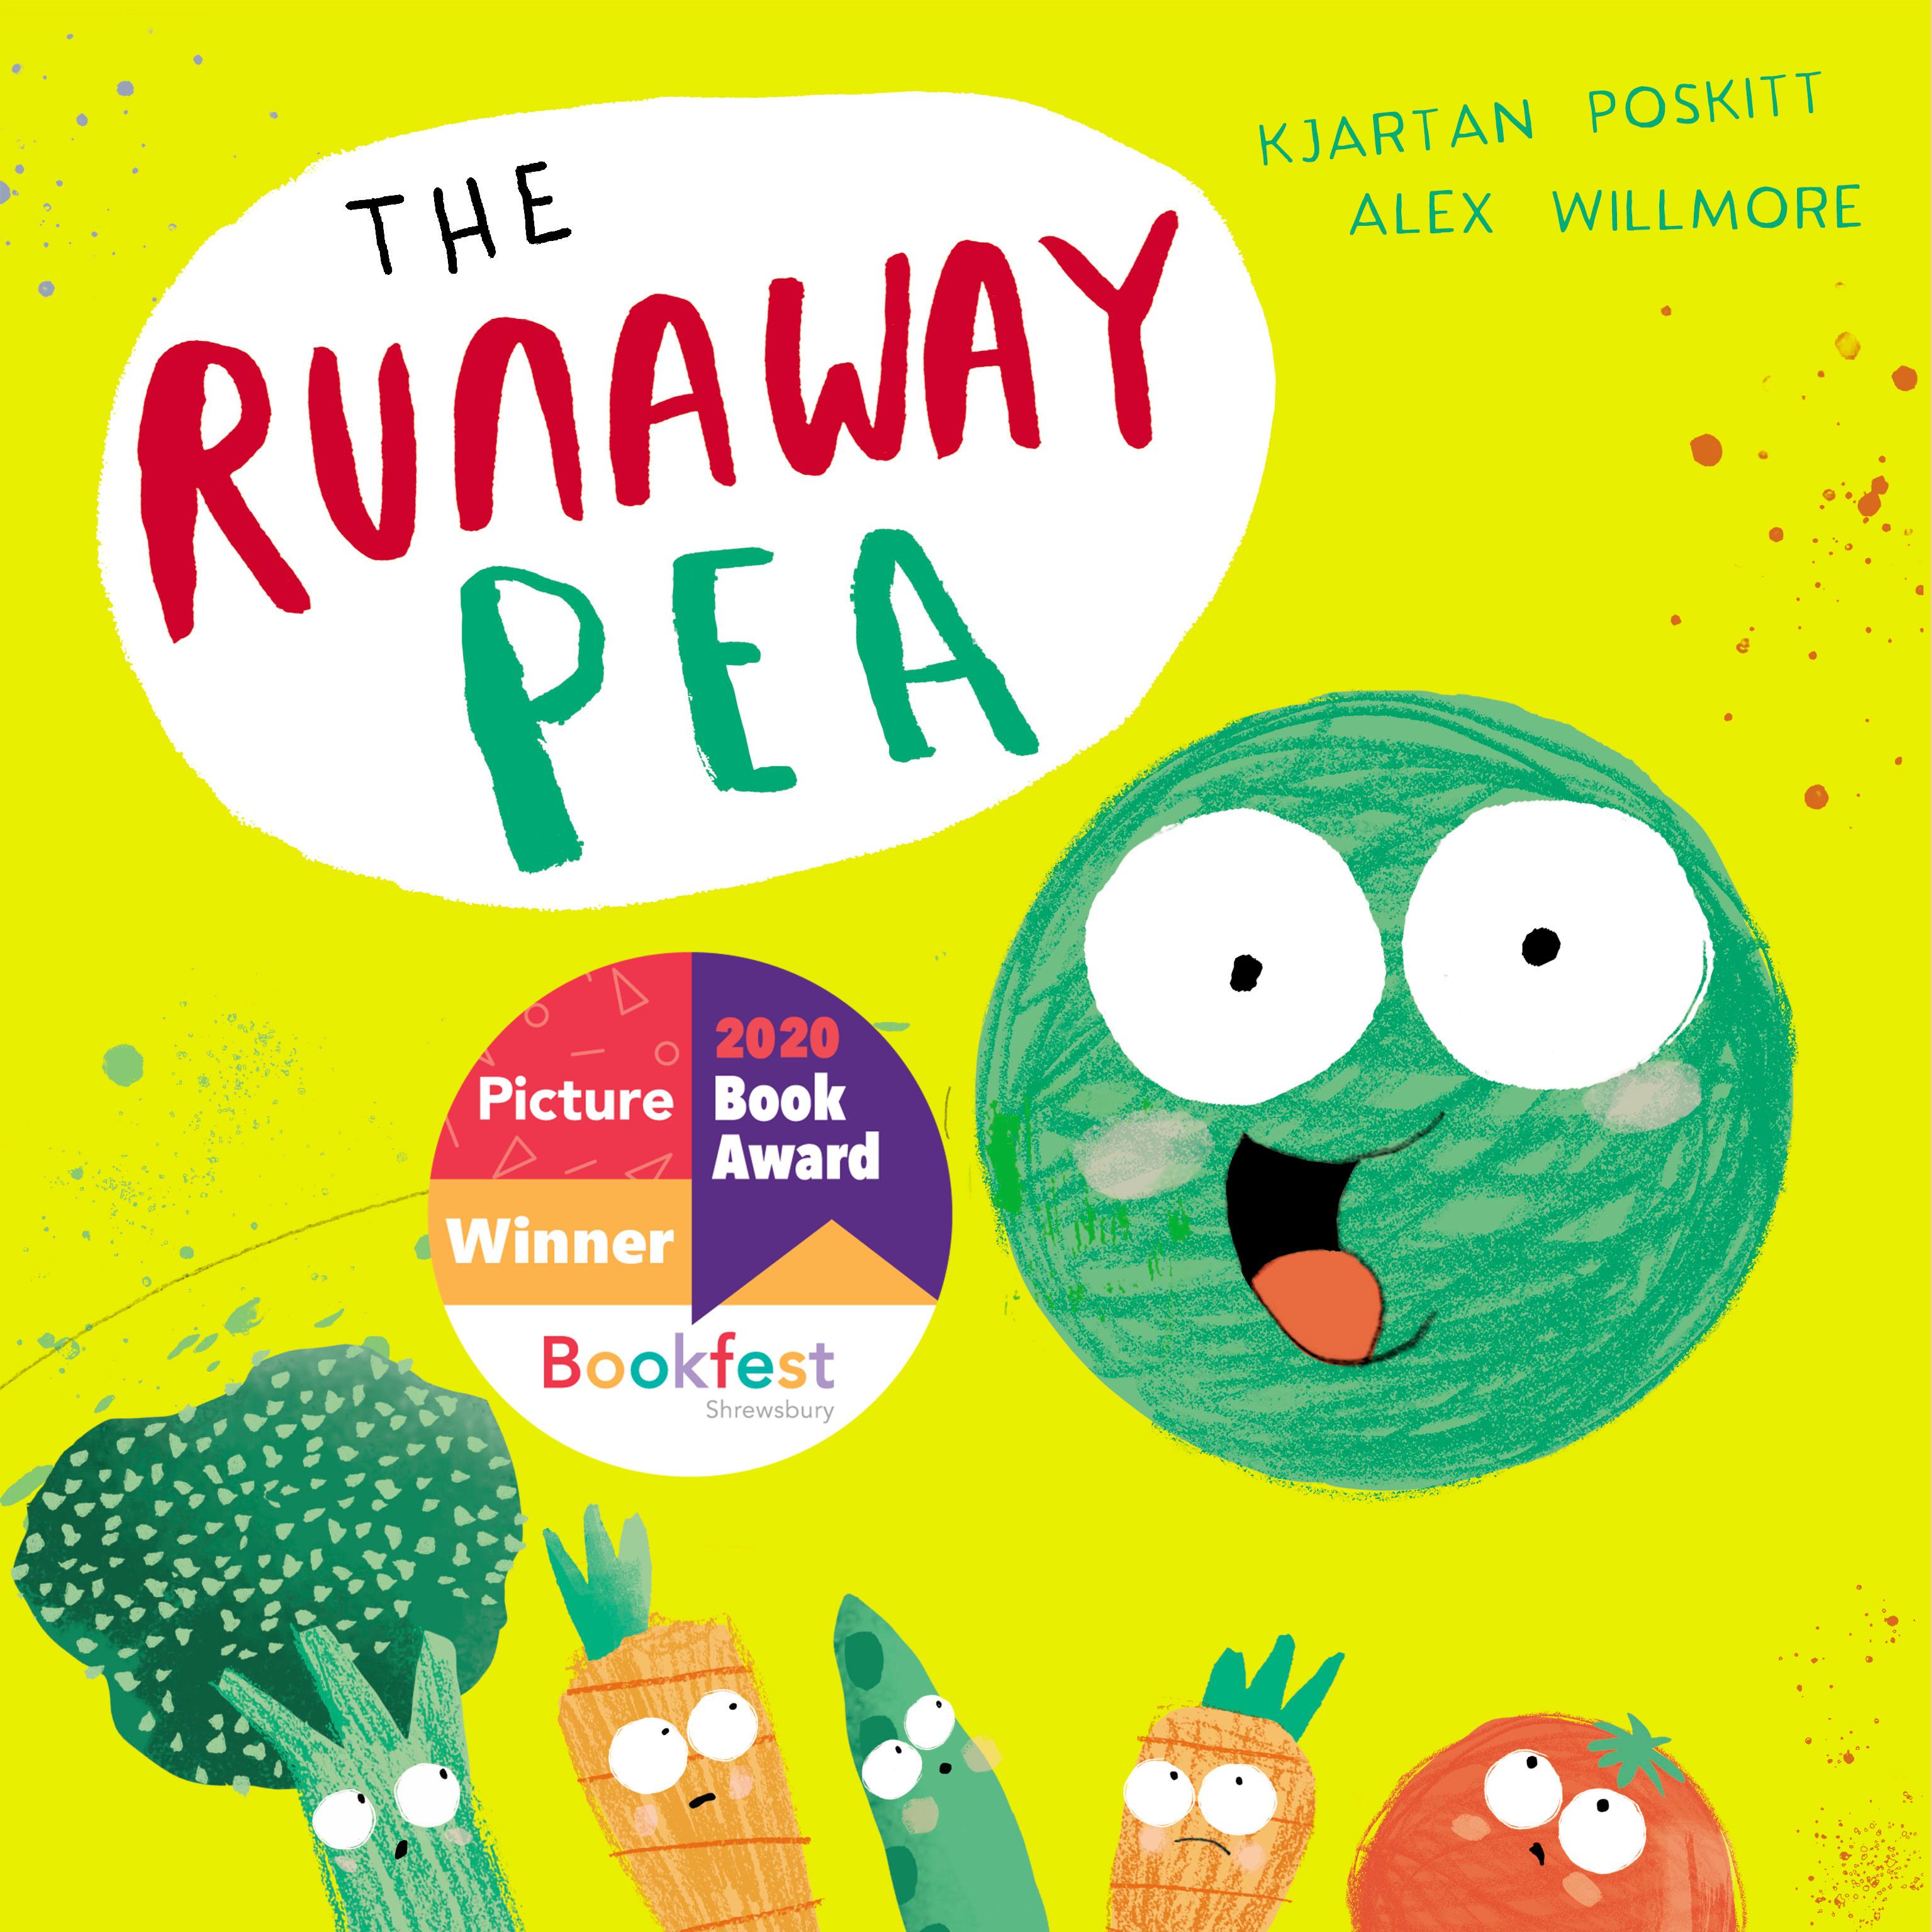 The Runaway Pea winner